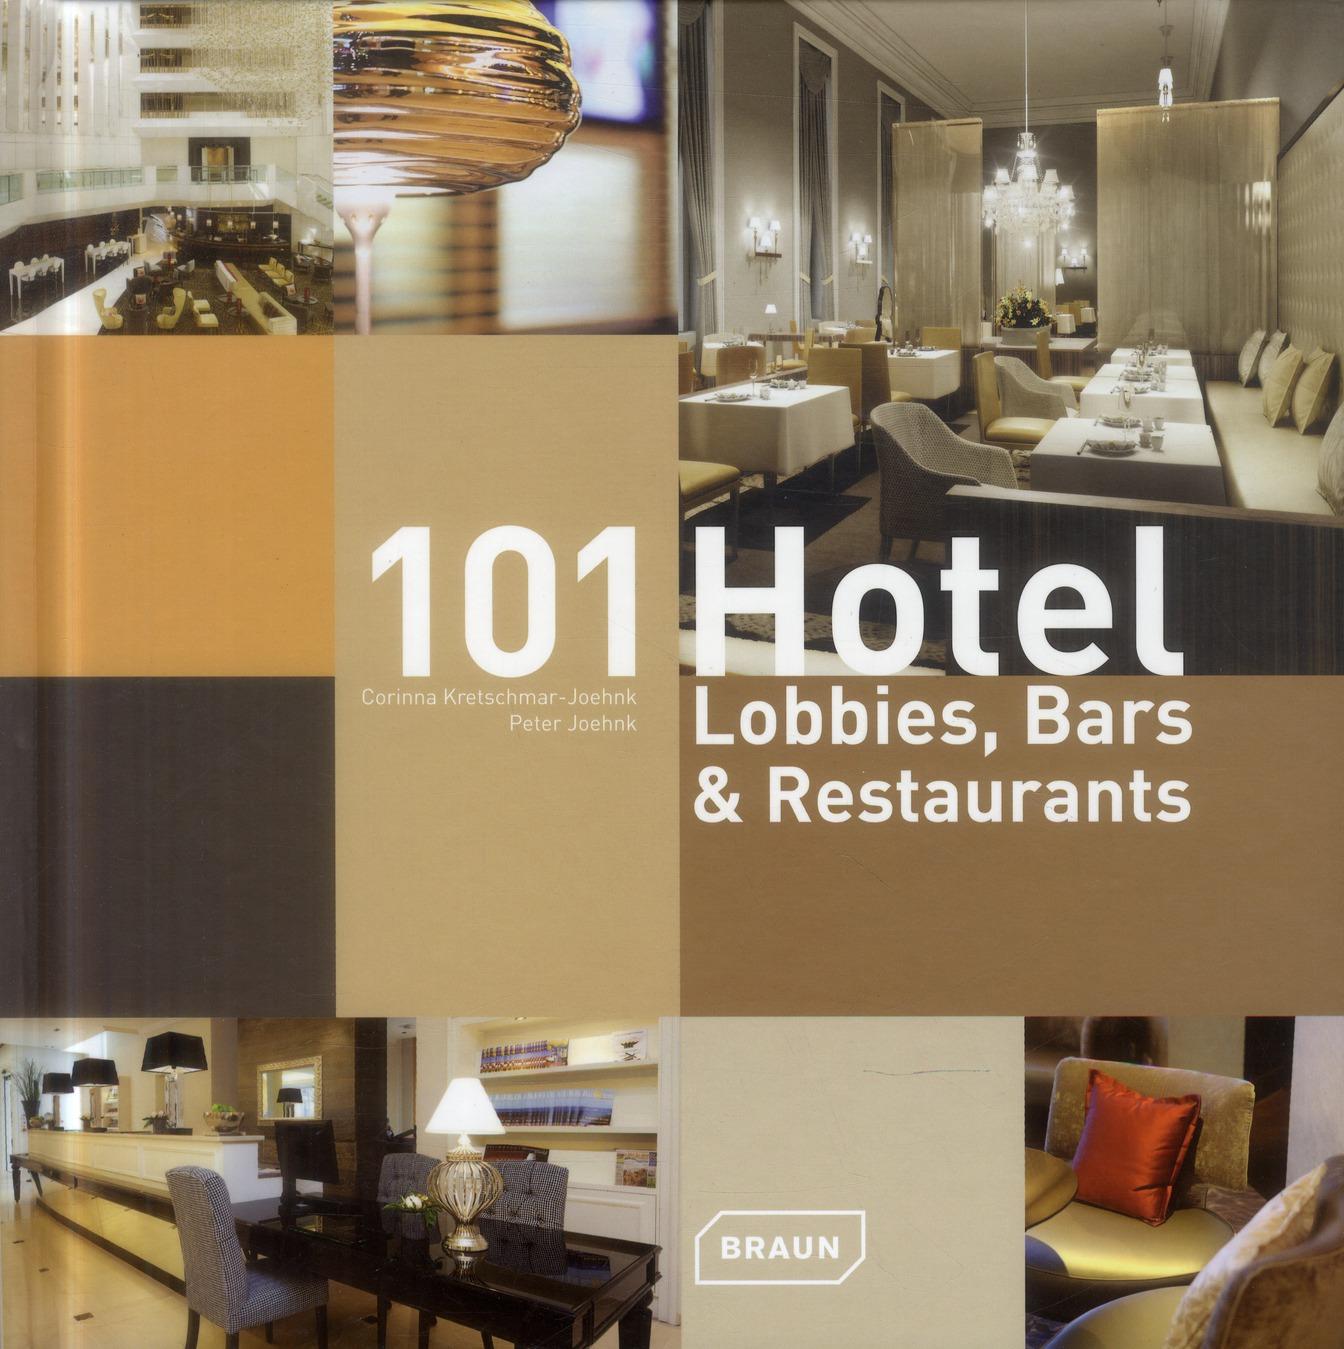 101 HOTEL - LOBBIES, BARS ET RESTAURANTS.